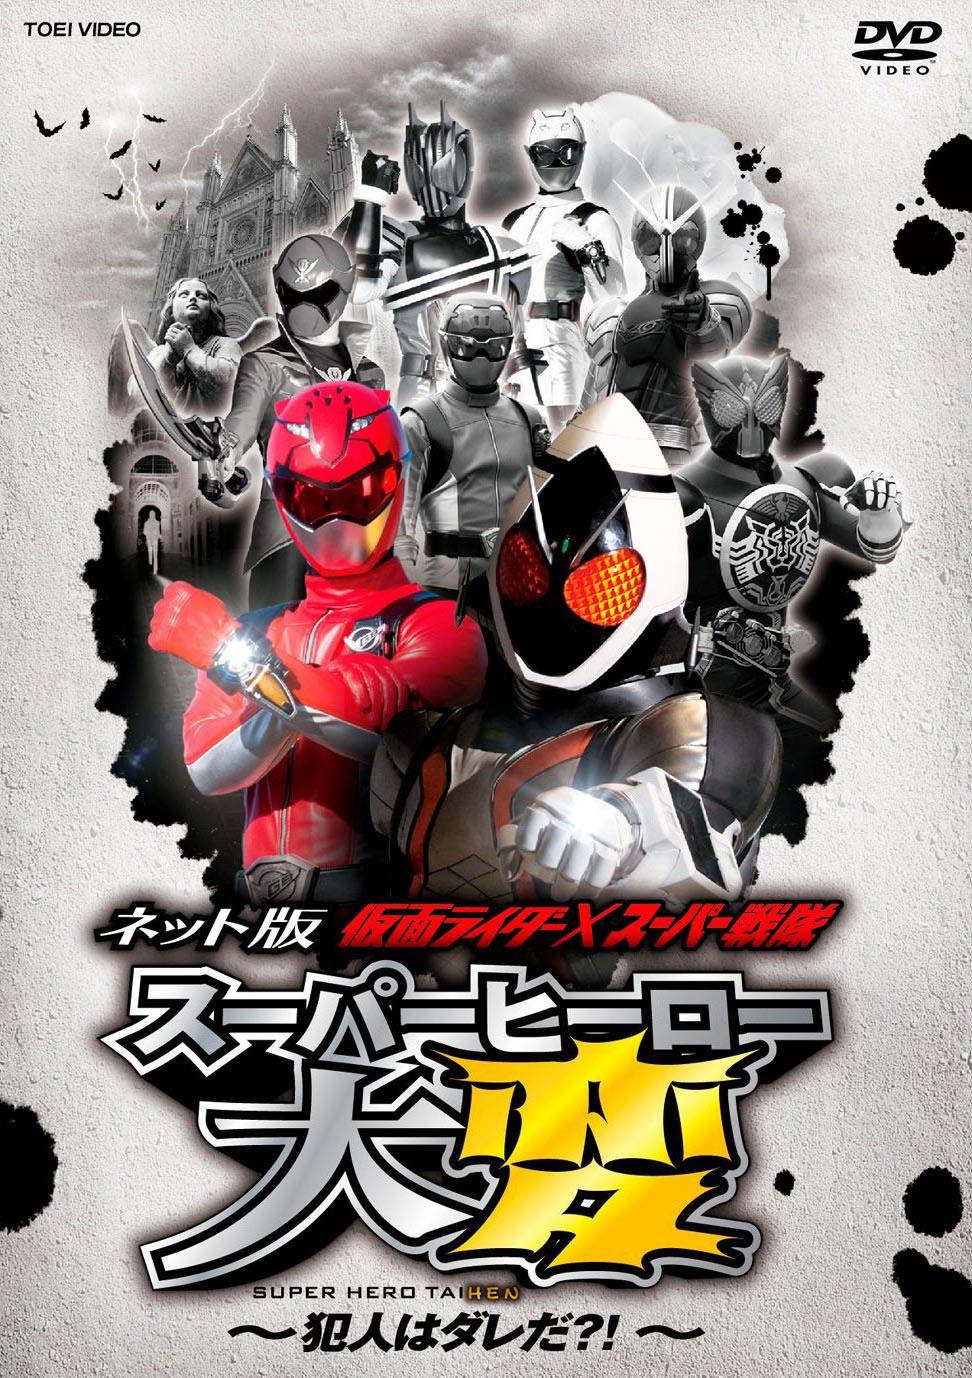 Kamen Rider X Super Sentai: Super Hero Taihen: Who Is the Culprit?! kapak